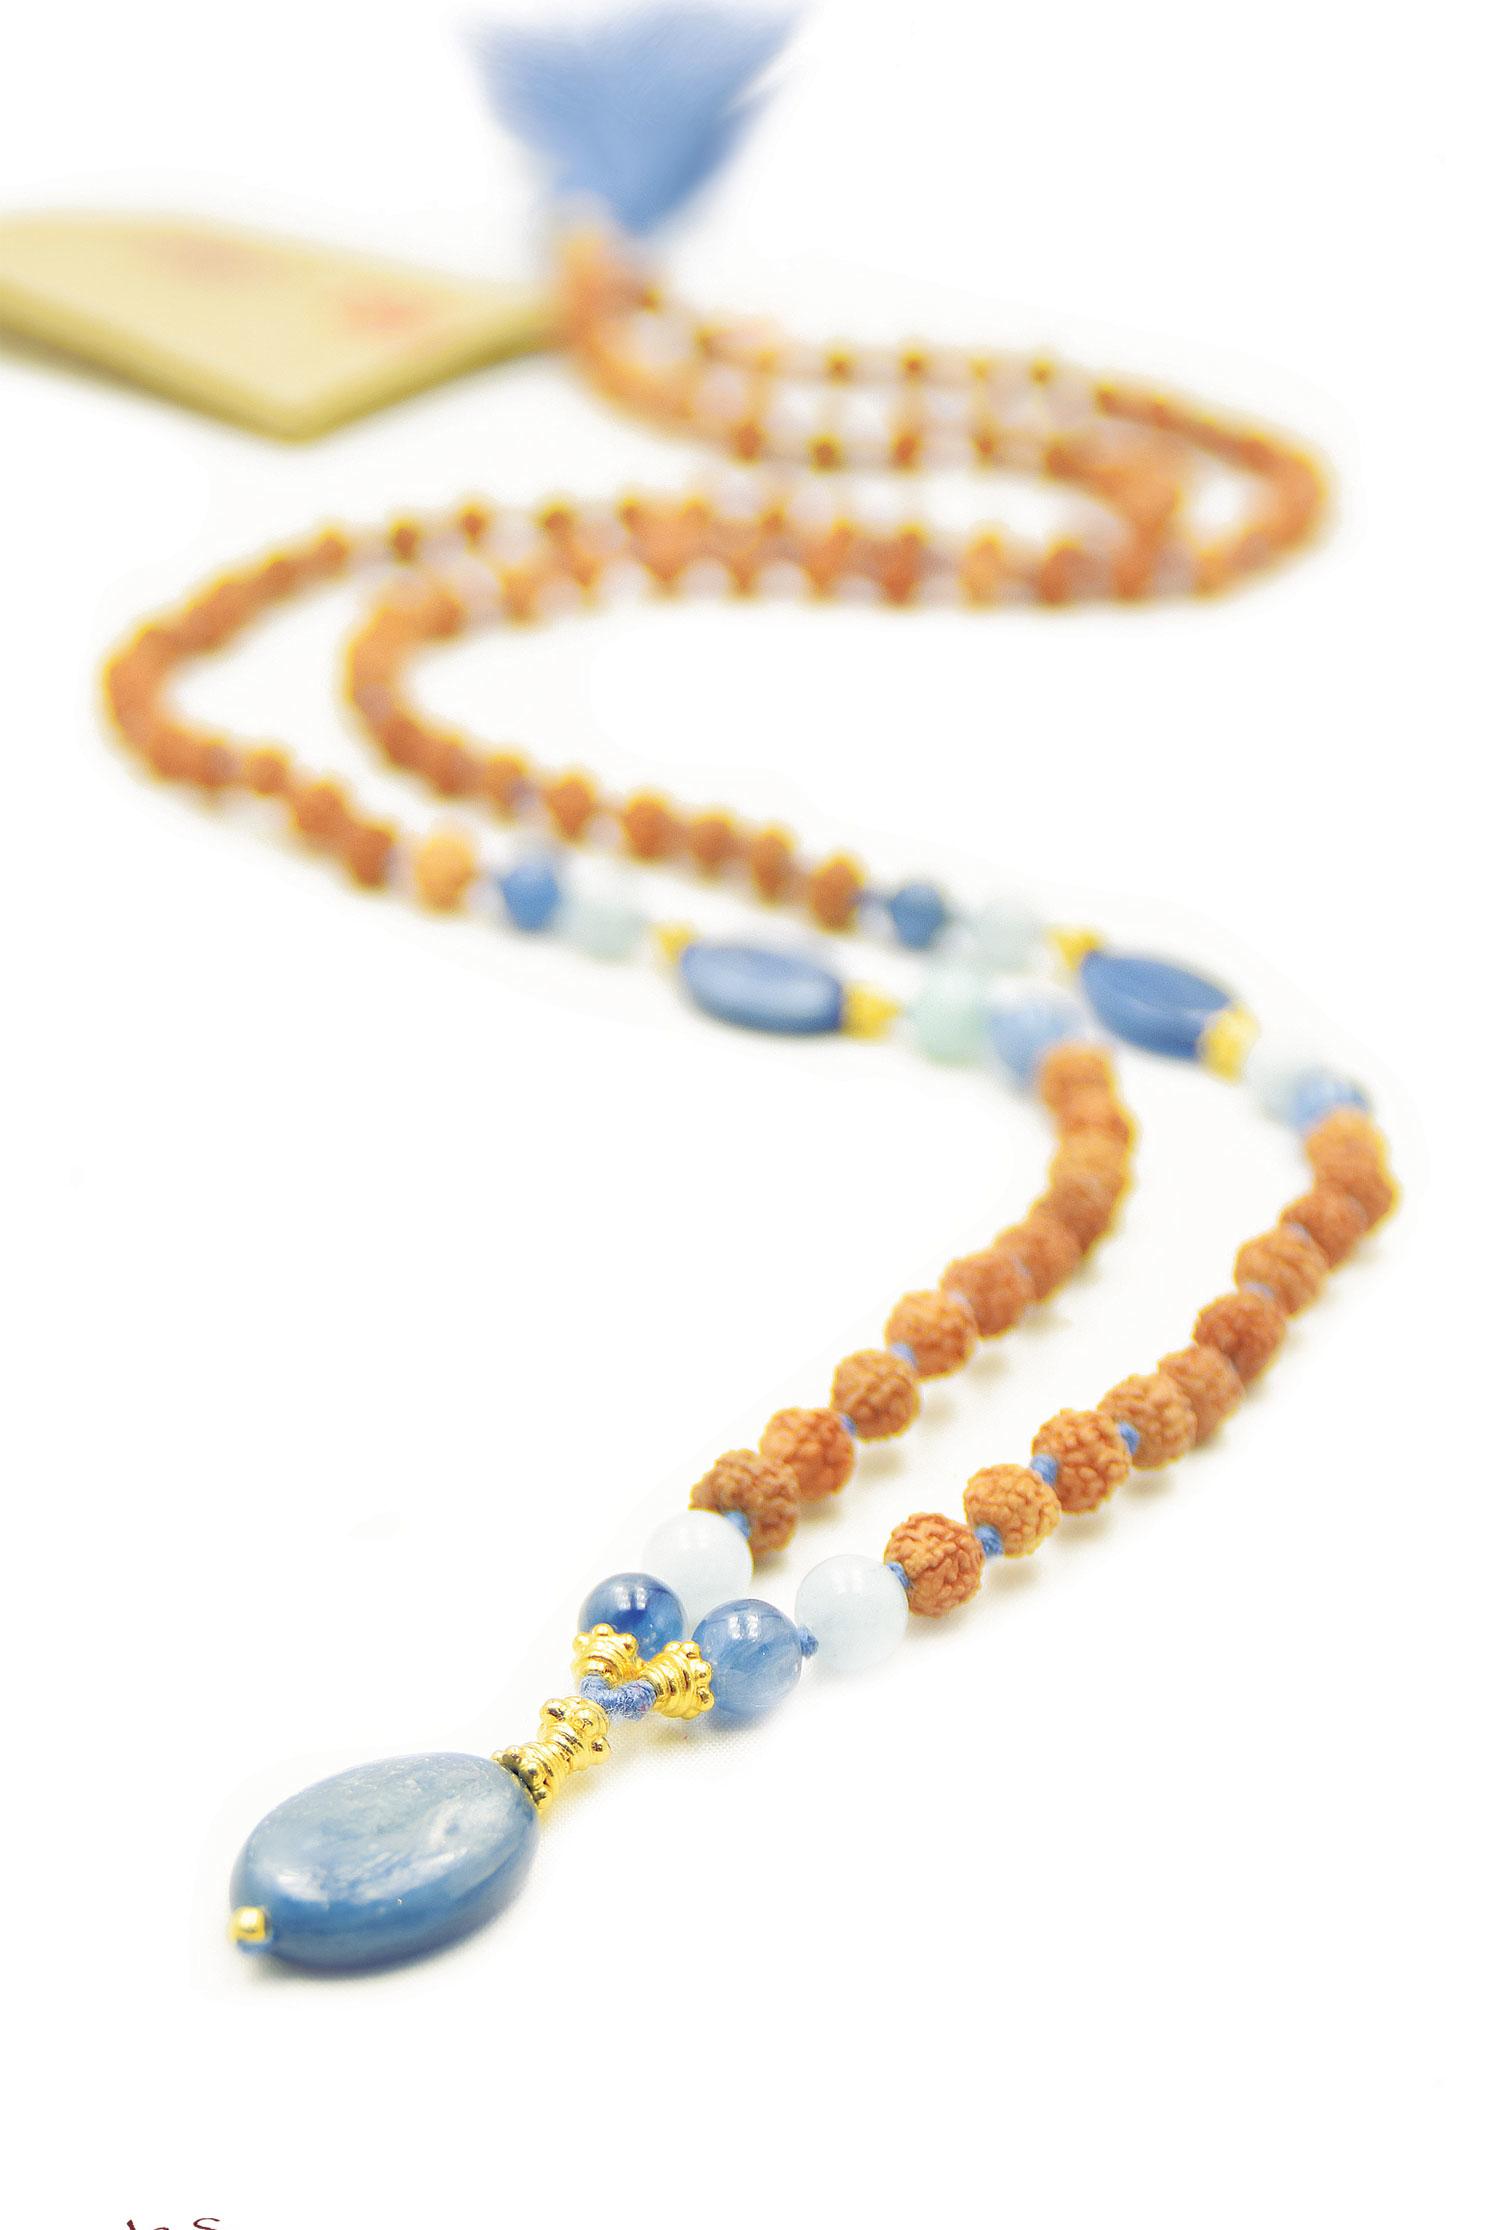 Spiritual Guidance mala necklace